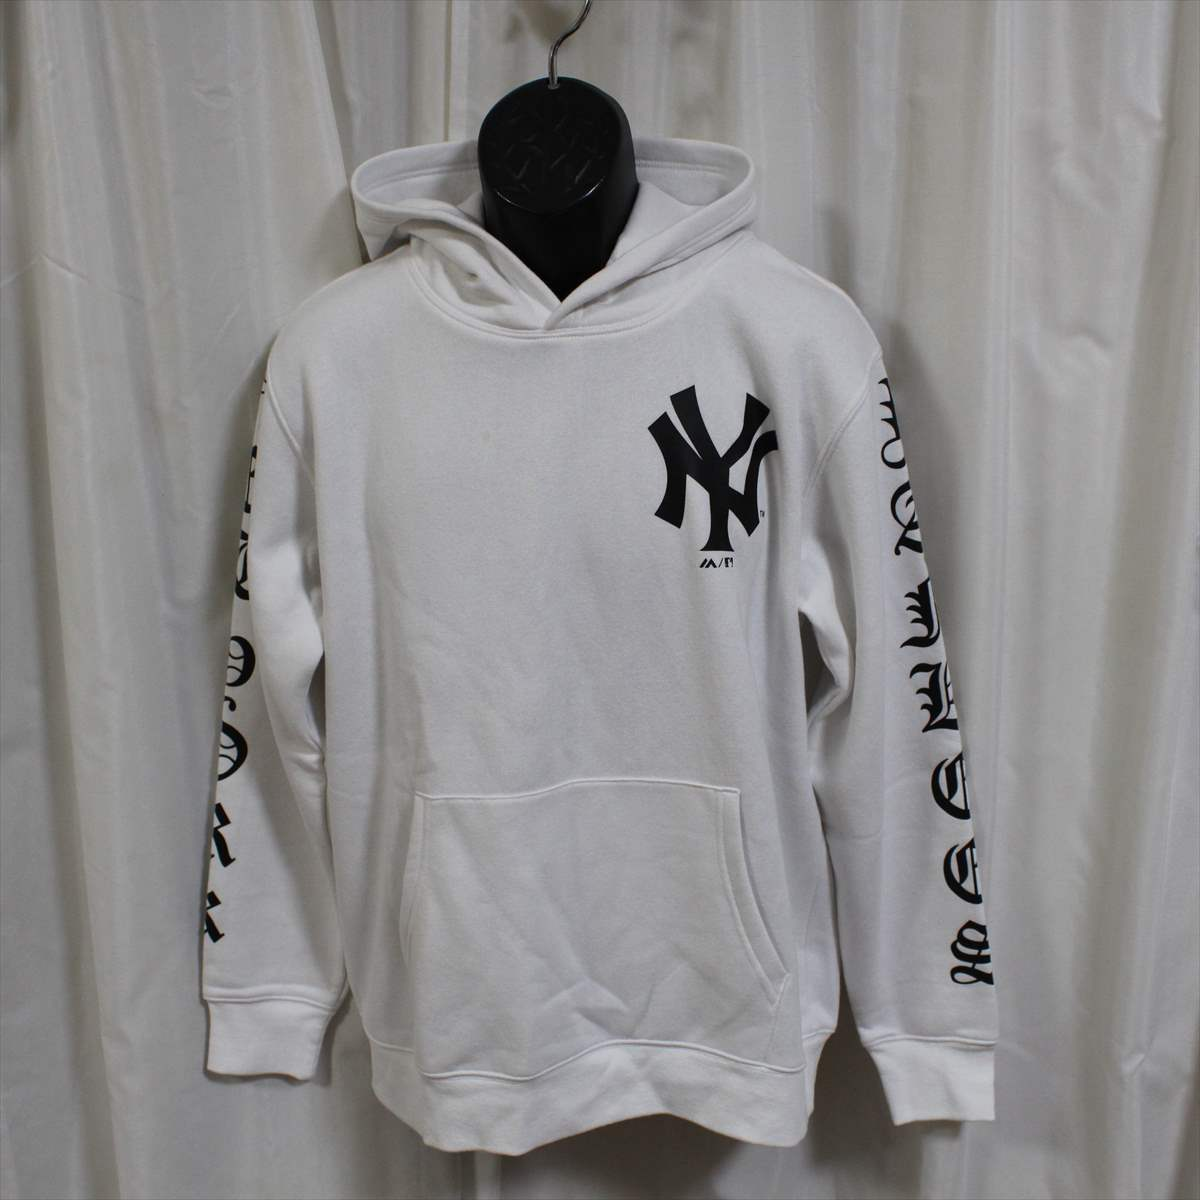 Majestic マジェスティック パーカー ホワイト Lサイズ 新品 白 ニューヨークヤンキース NEW YORK YANKEES フーディー プルオーバー_画像1